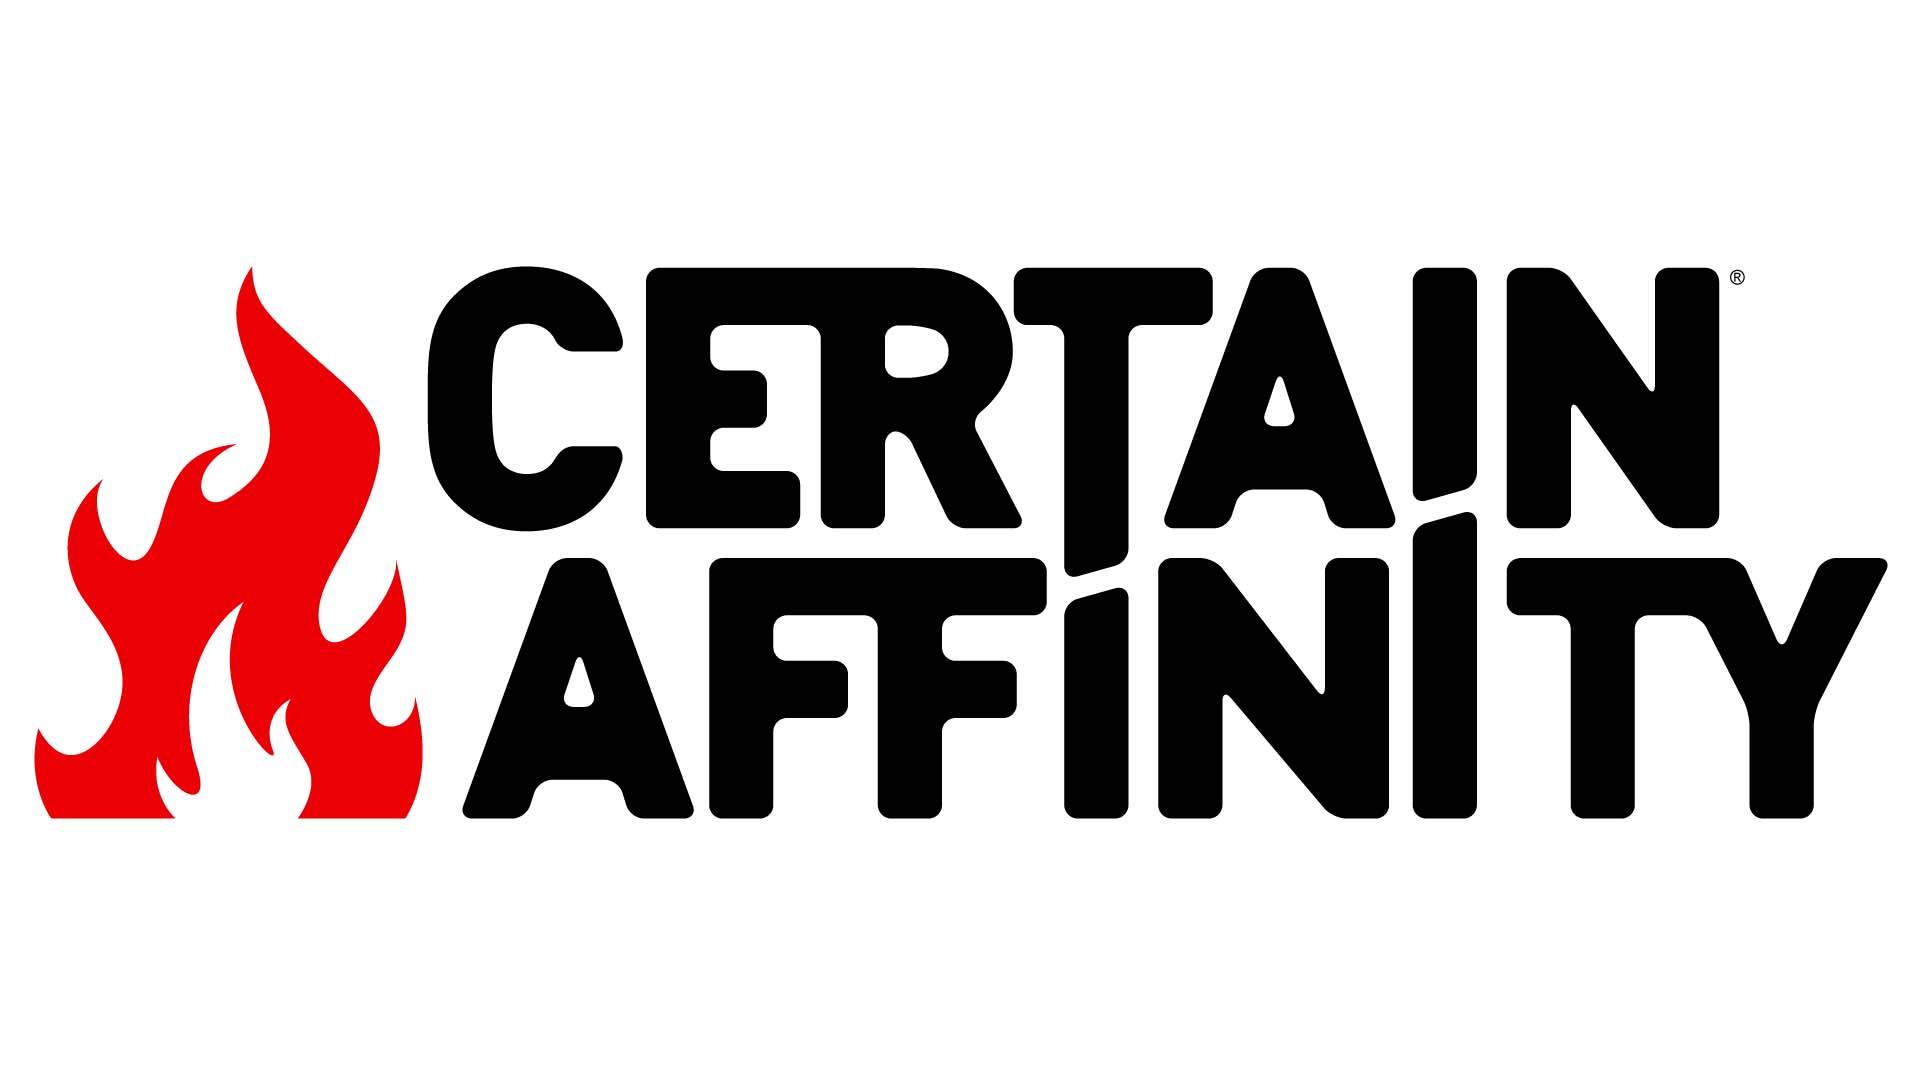 Certain Affinity